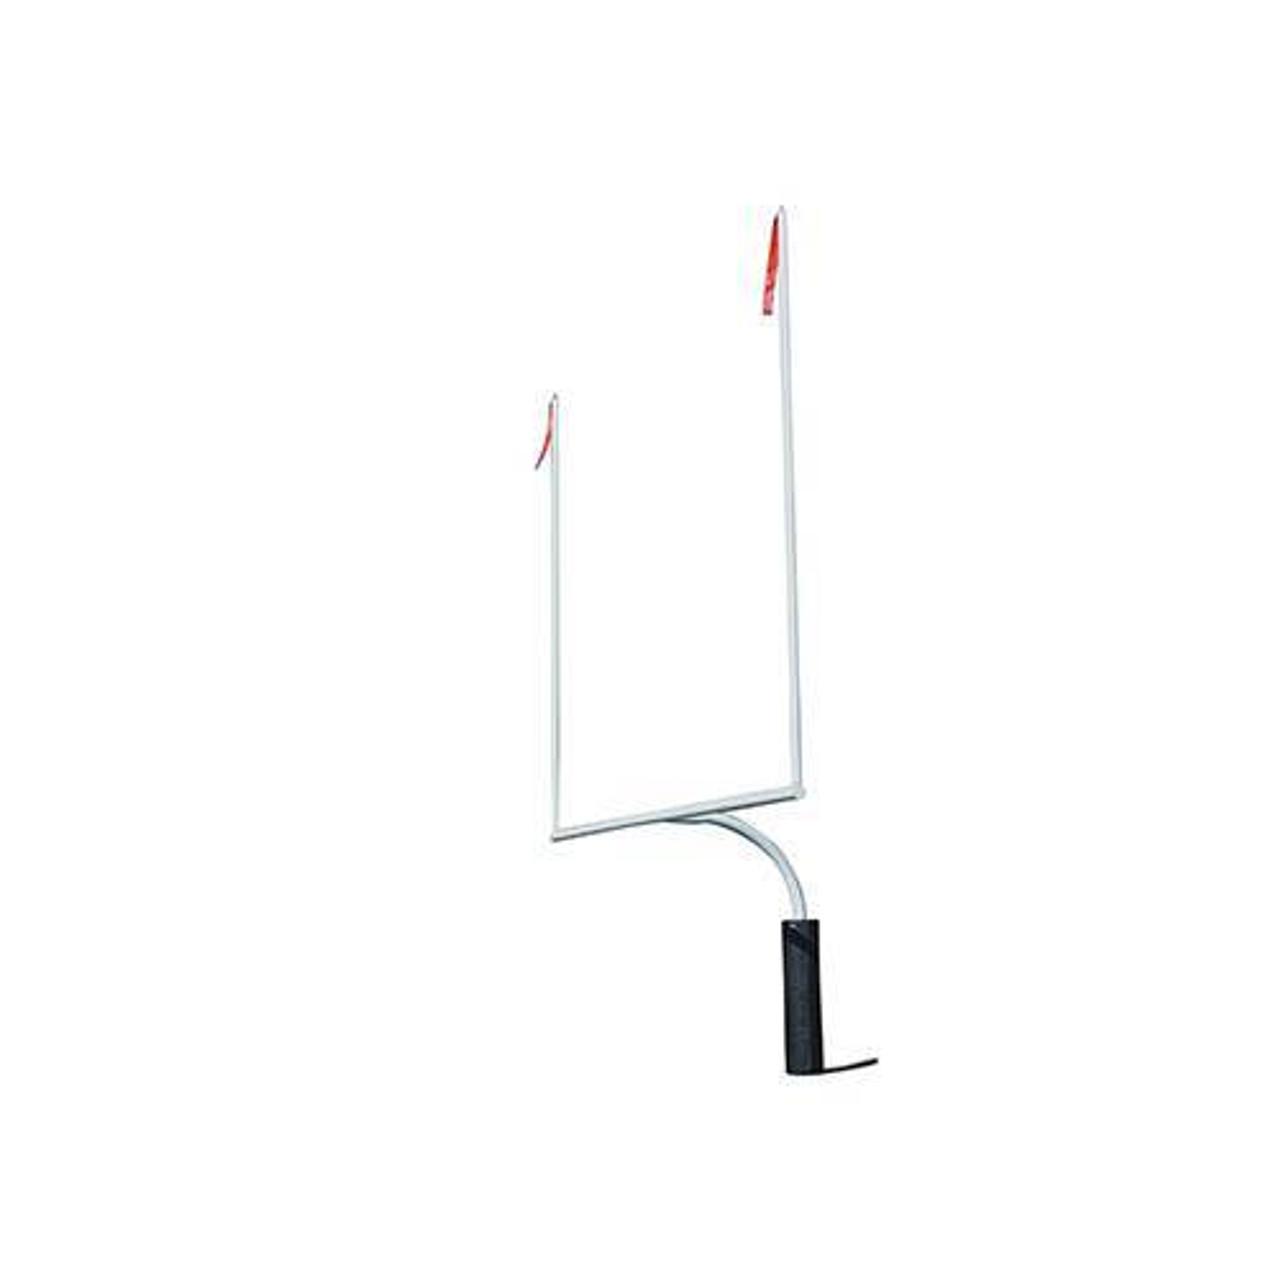 Gooseneck Football Goal Post Ground Sleeves